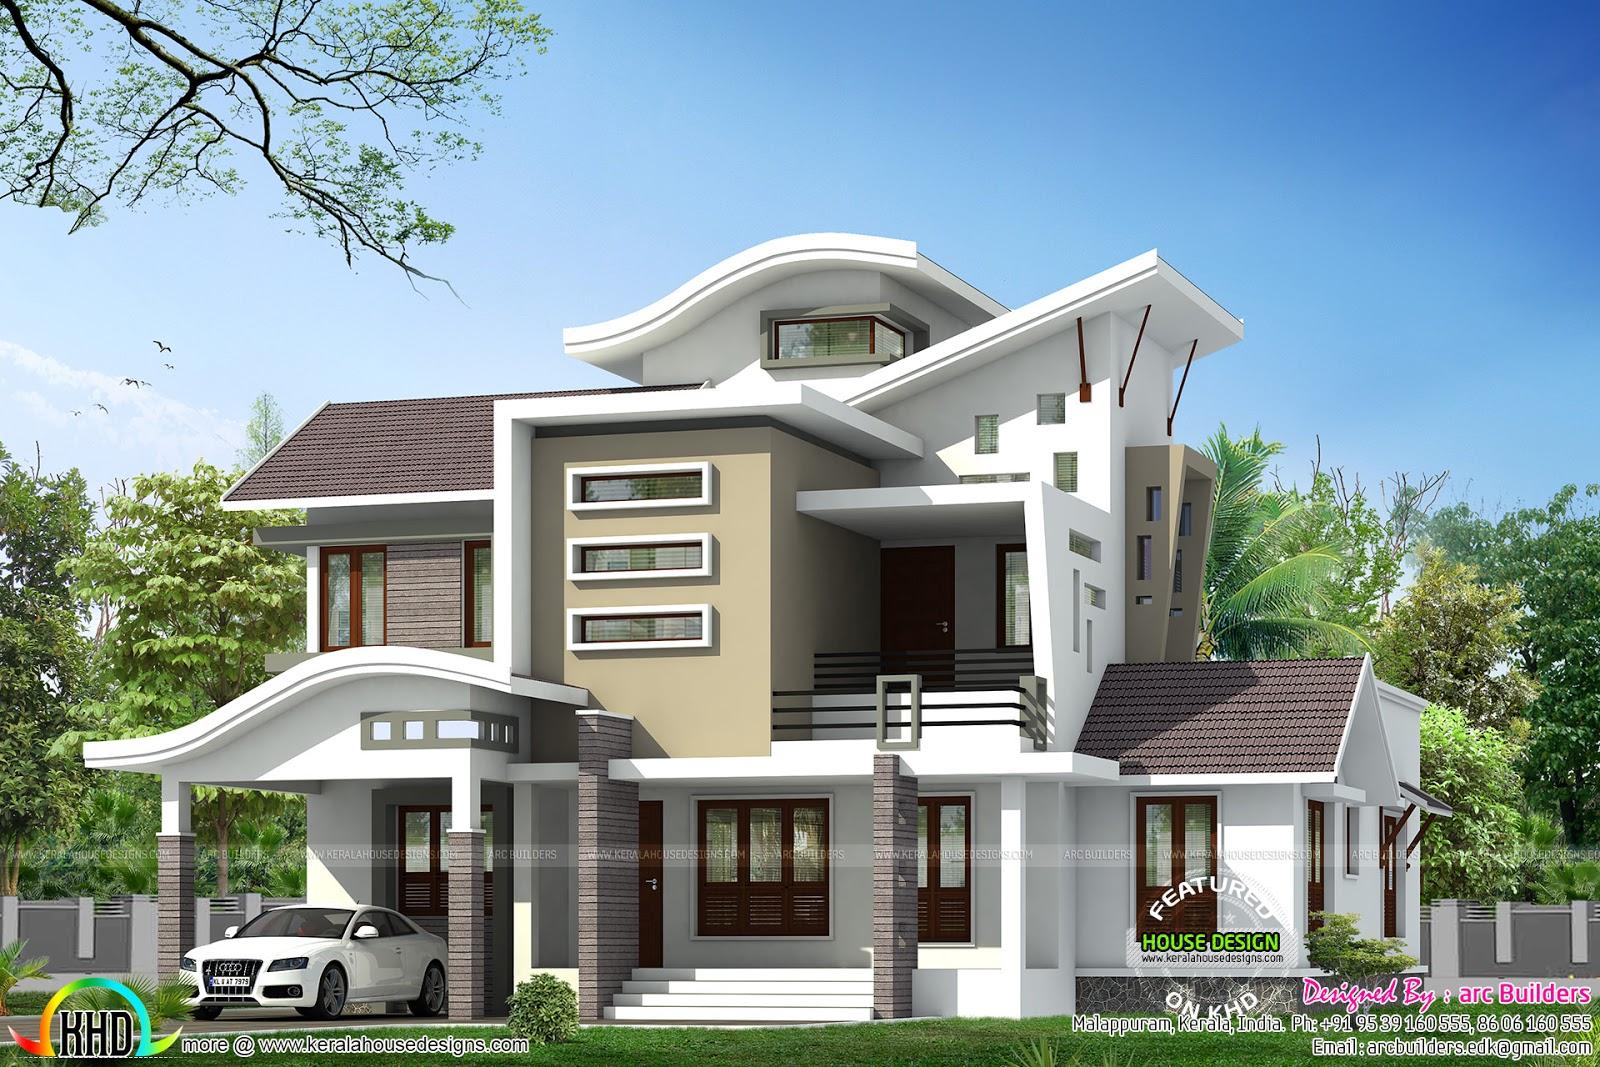 Best Kitchen Gallery: 2450 Sq Feet Home Design From Kasaragod Kerala Kerala Home Design of Modern Home Design Photos  on rachelxblog.com